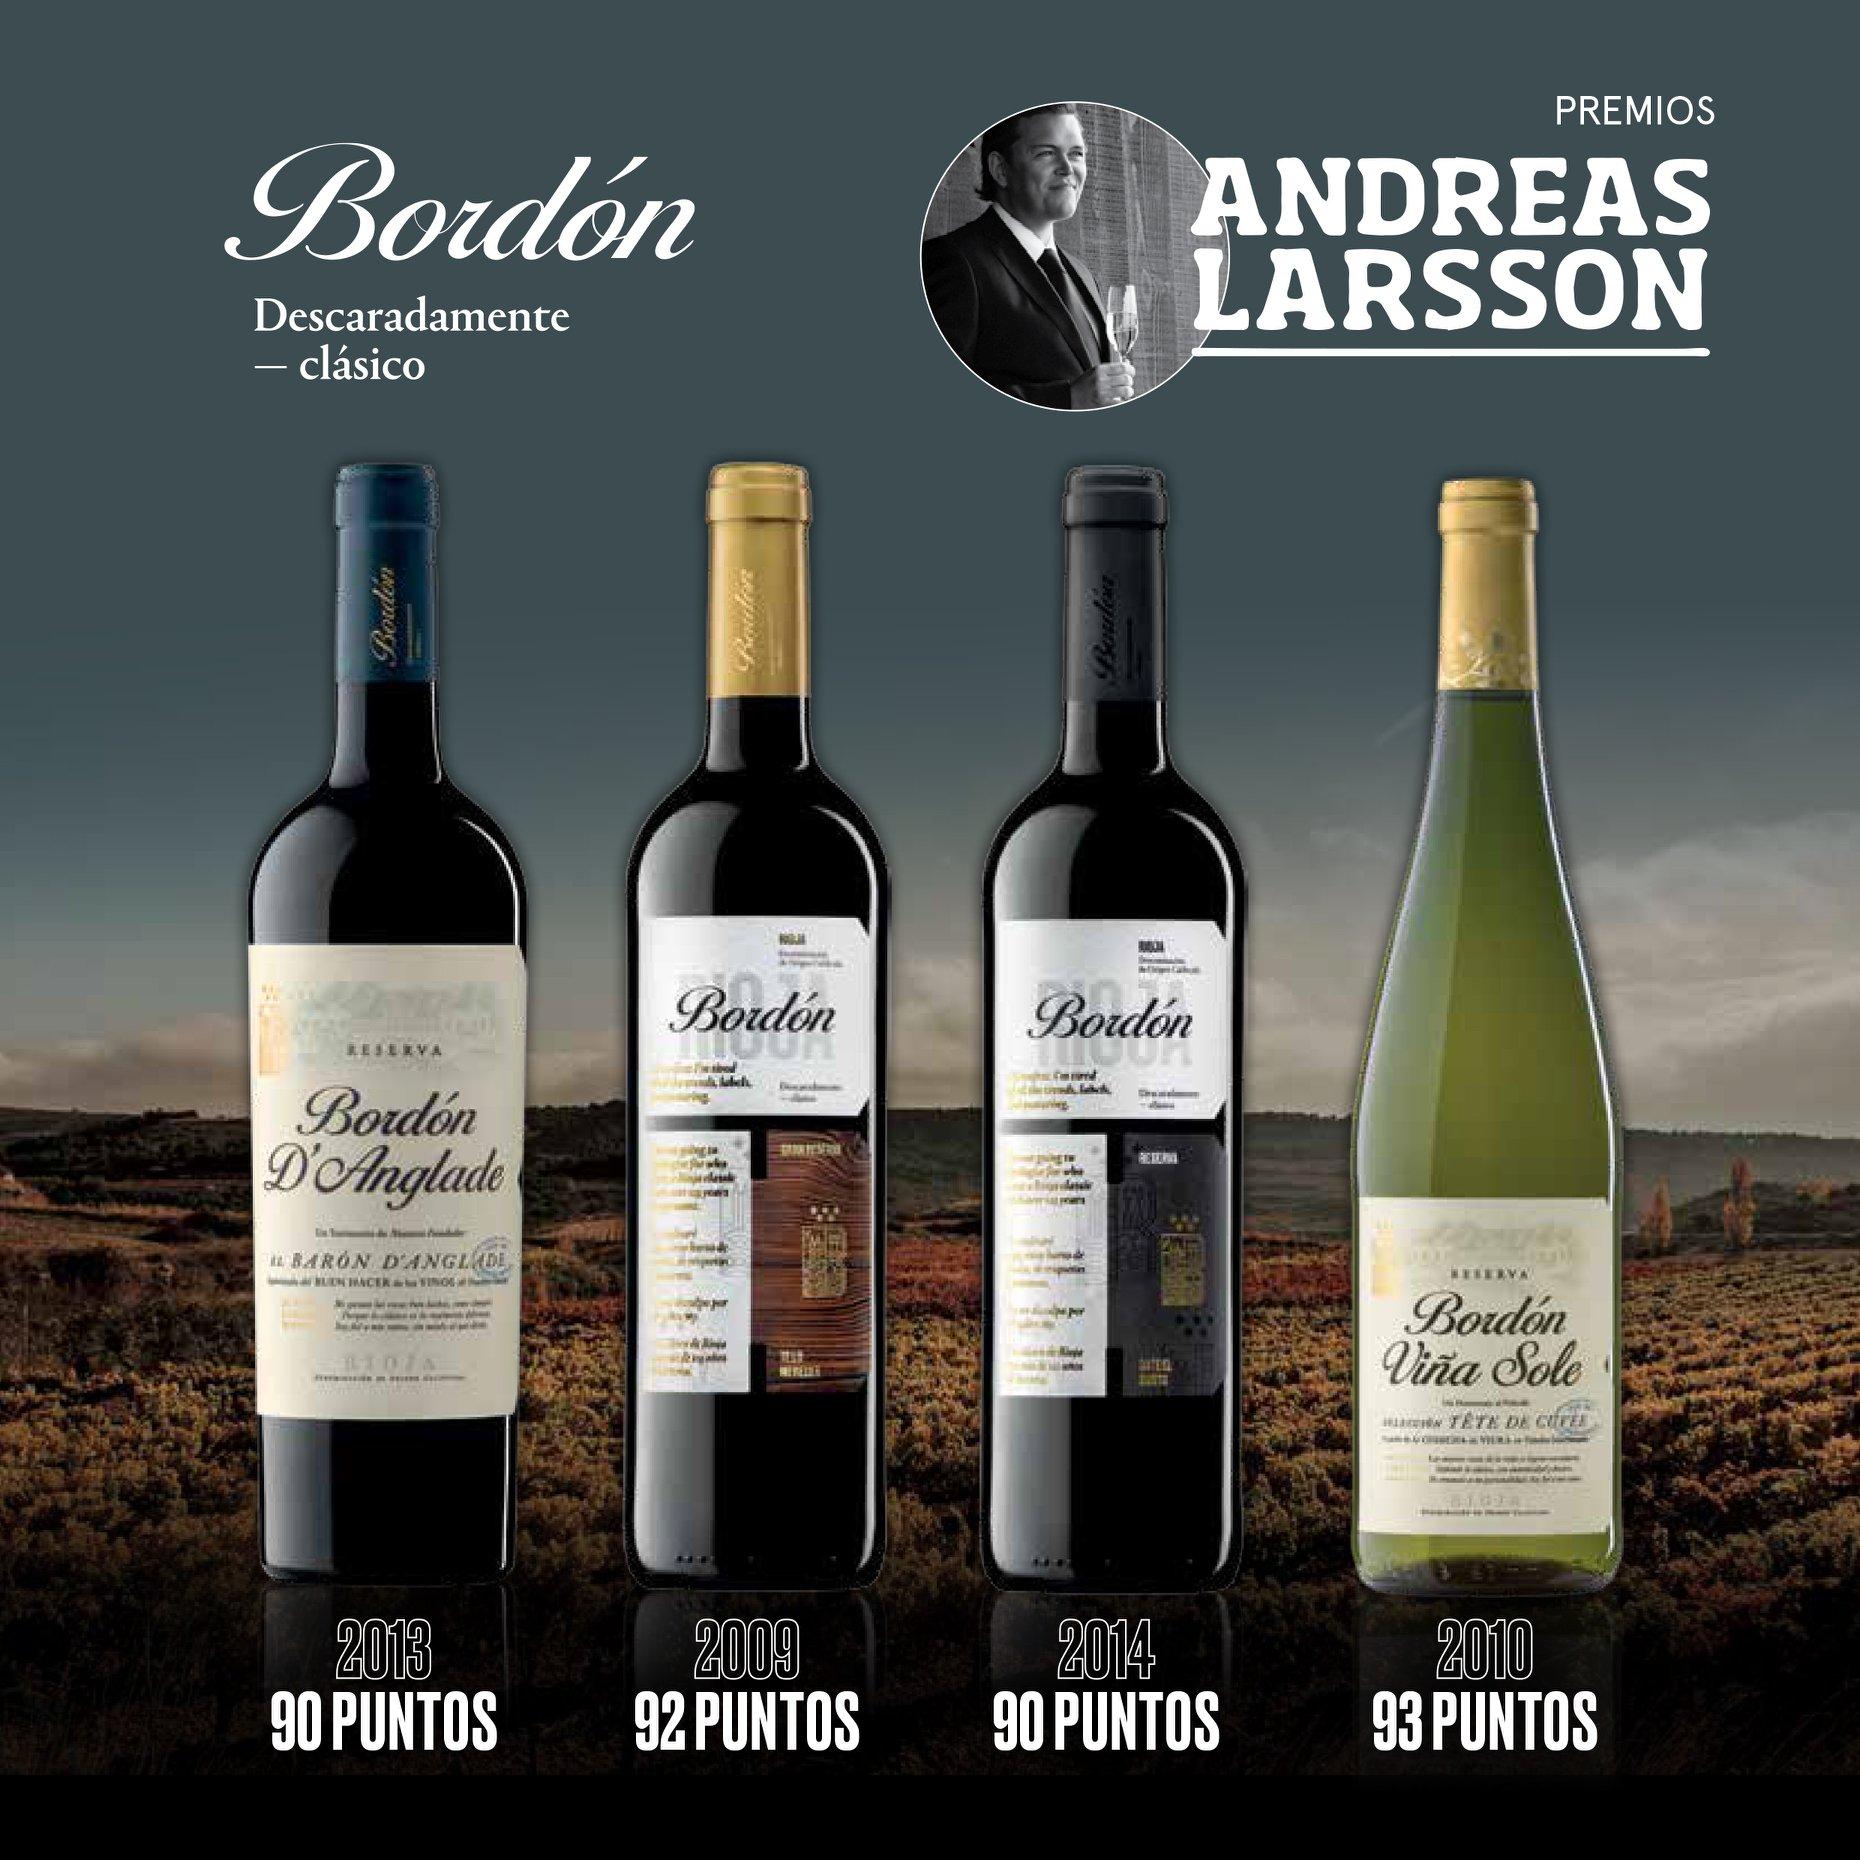 Andreas Larsson